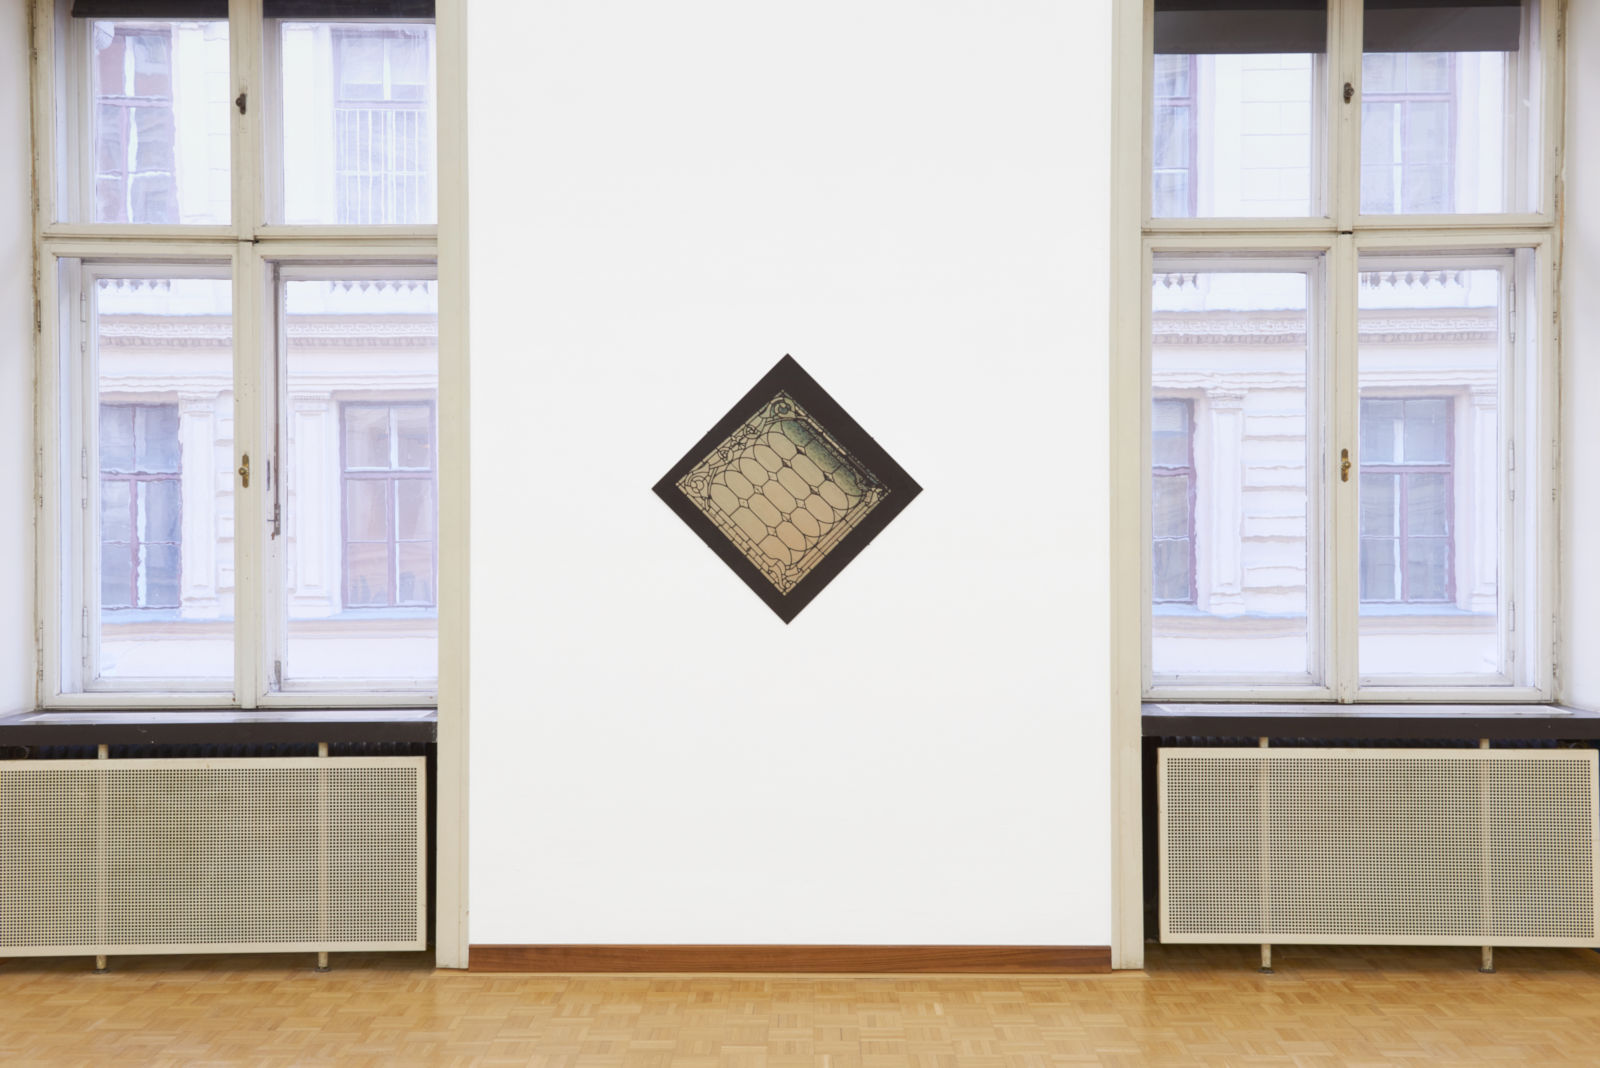 Galerie-Meyer-Kainer-Helene-Fauquet 1